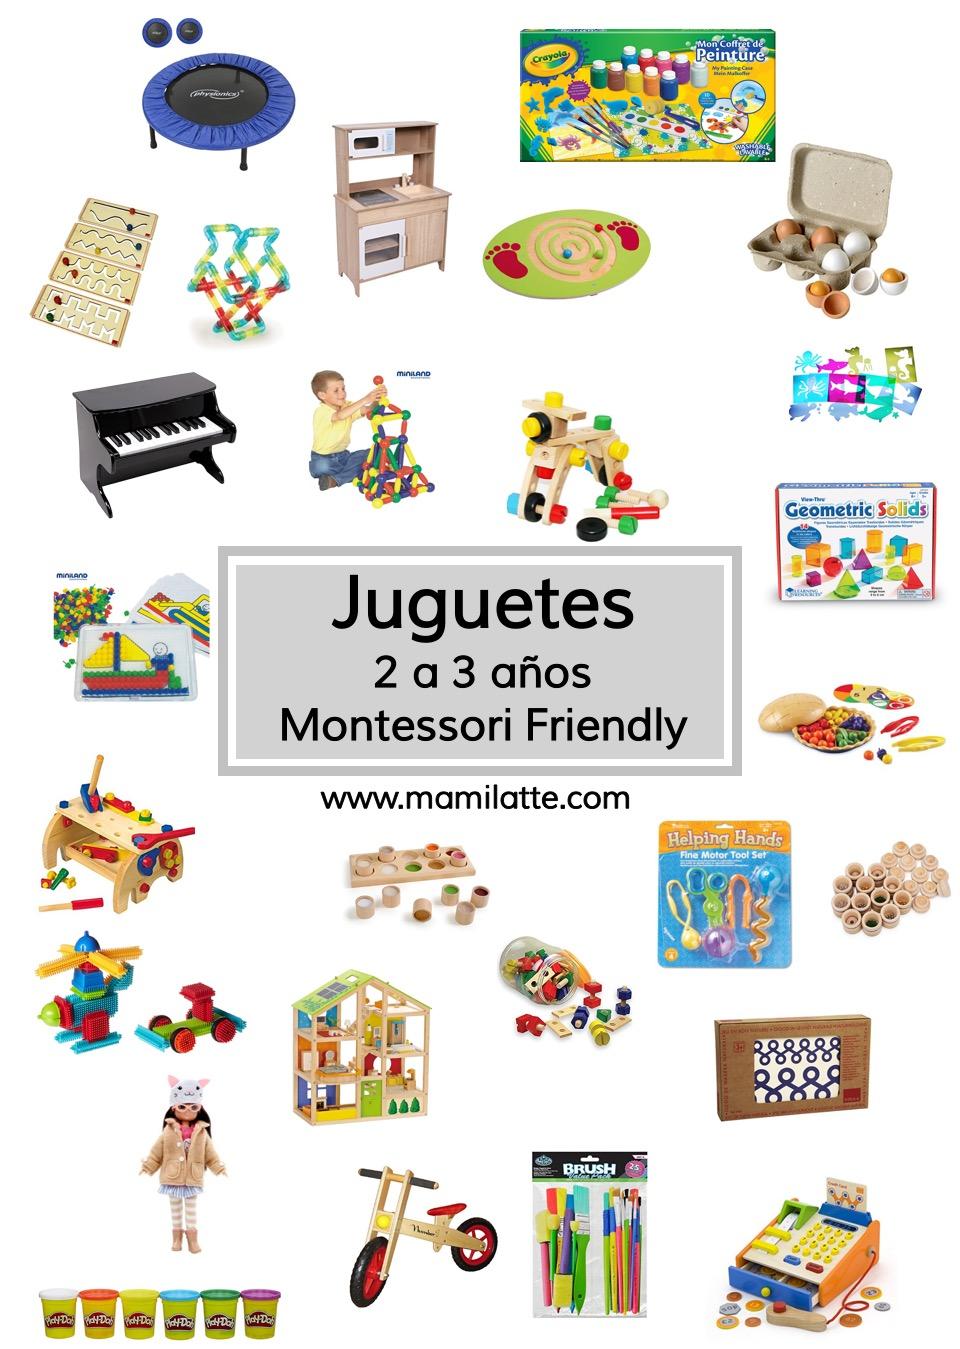 Juguetes de 2 a 3 años Montessori friendly. – Mamilatte